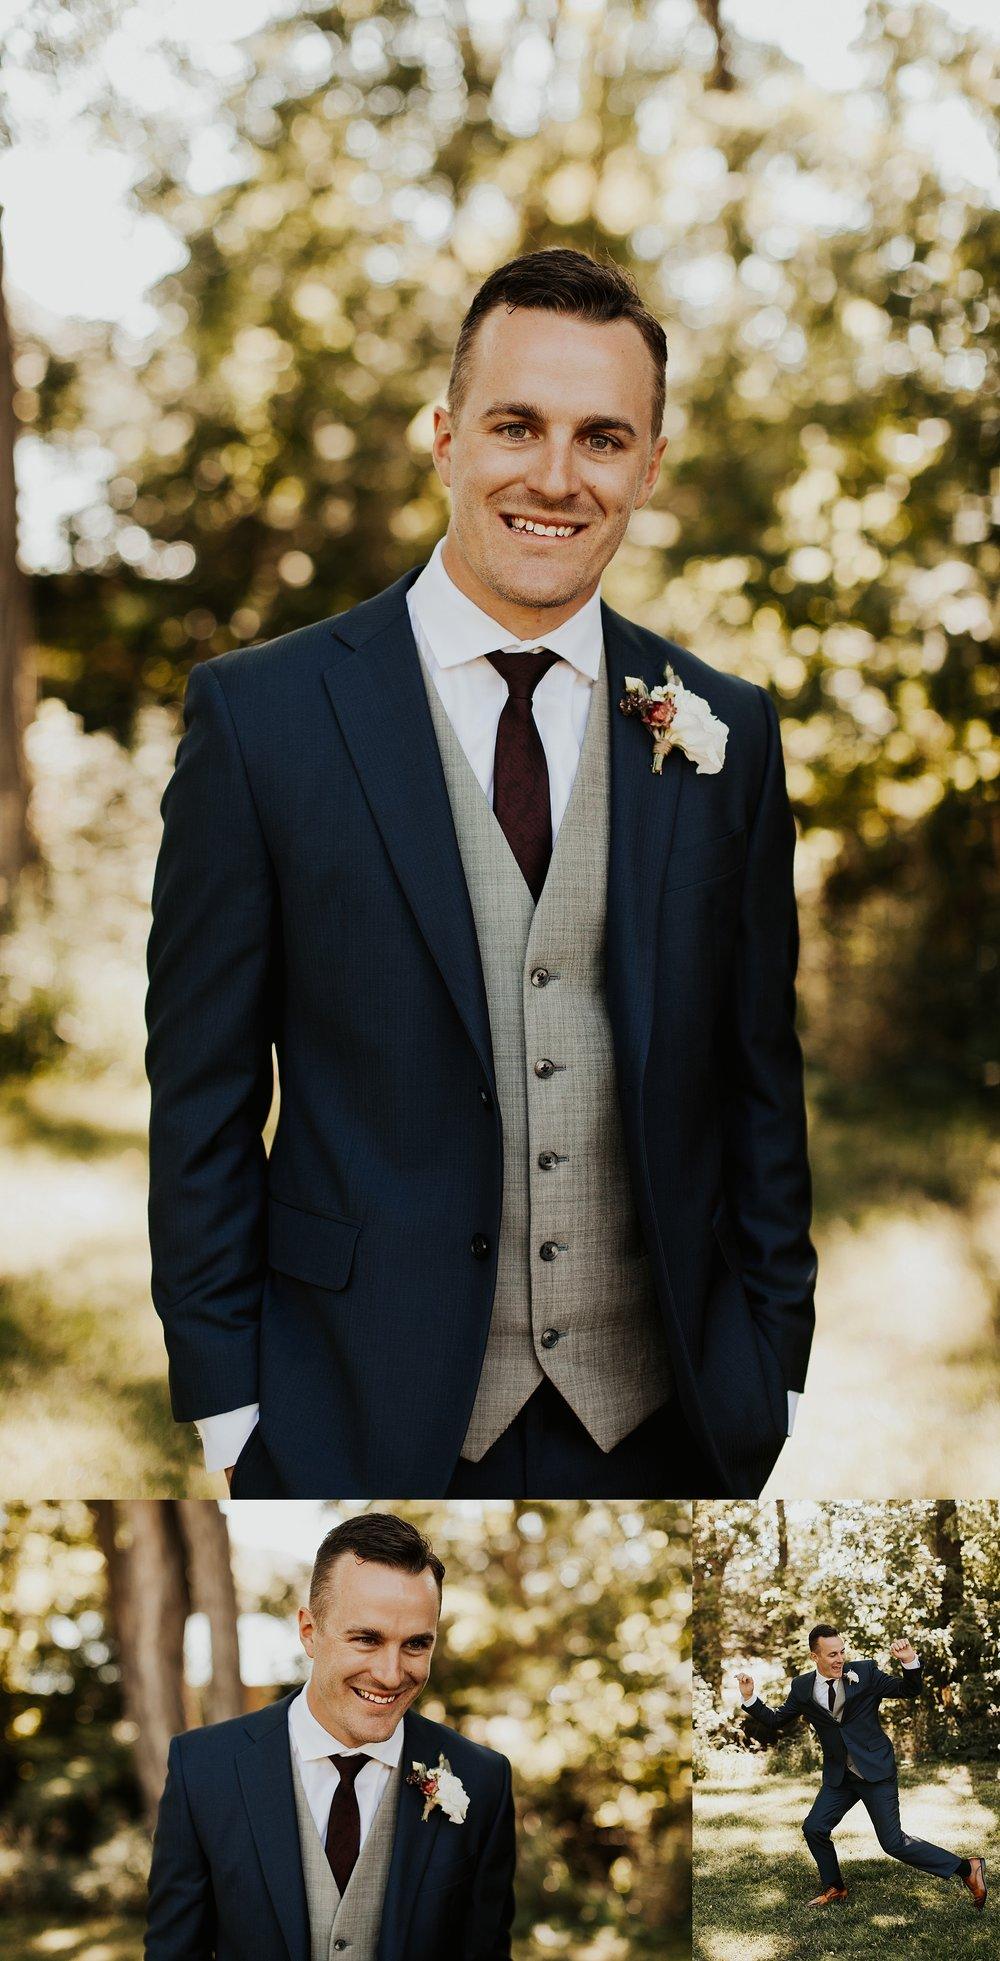 Lyons_Farmette_Wedding_Denver_Colorado_wedding022.JPG